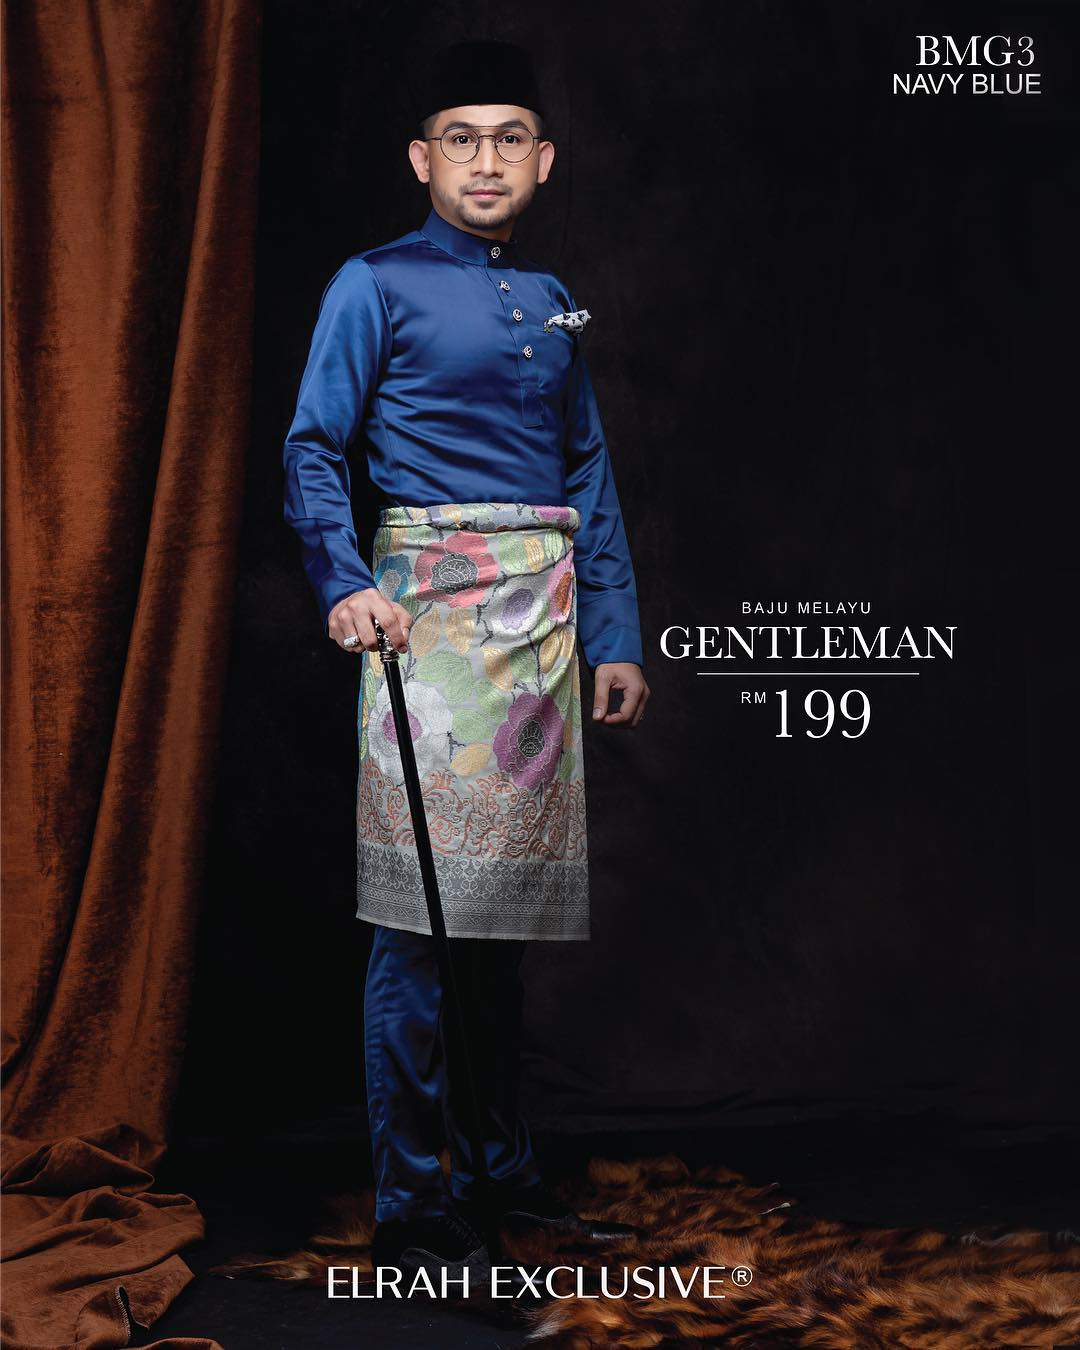 Baju Melayu Gentleman Navy Blue